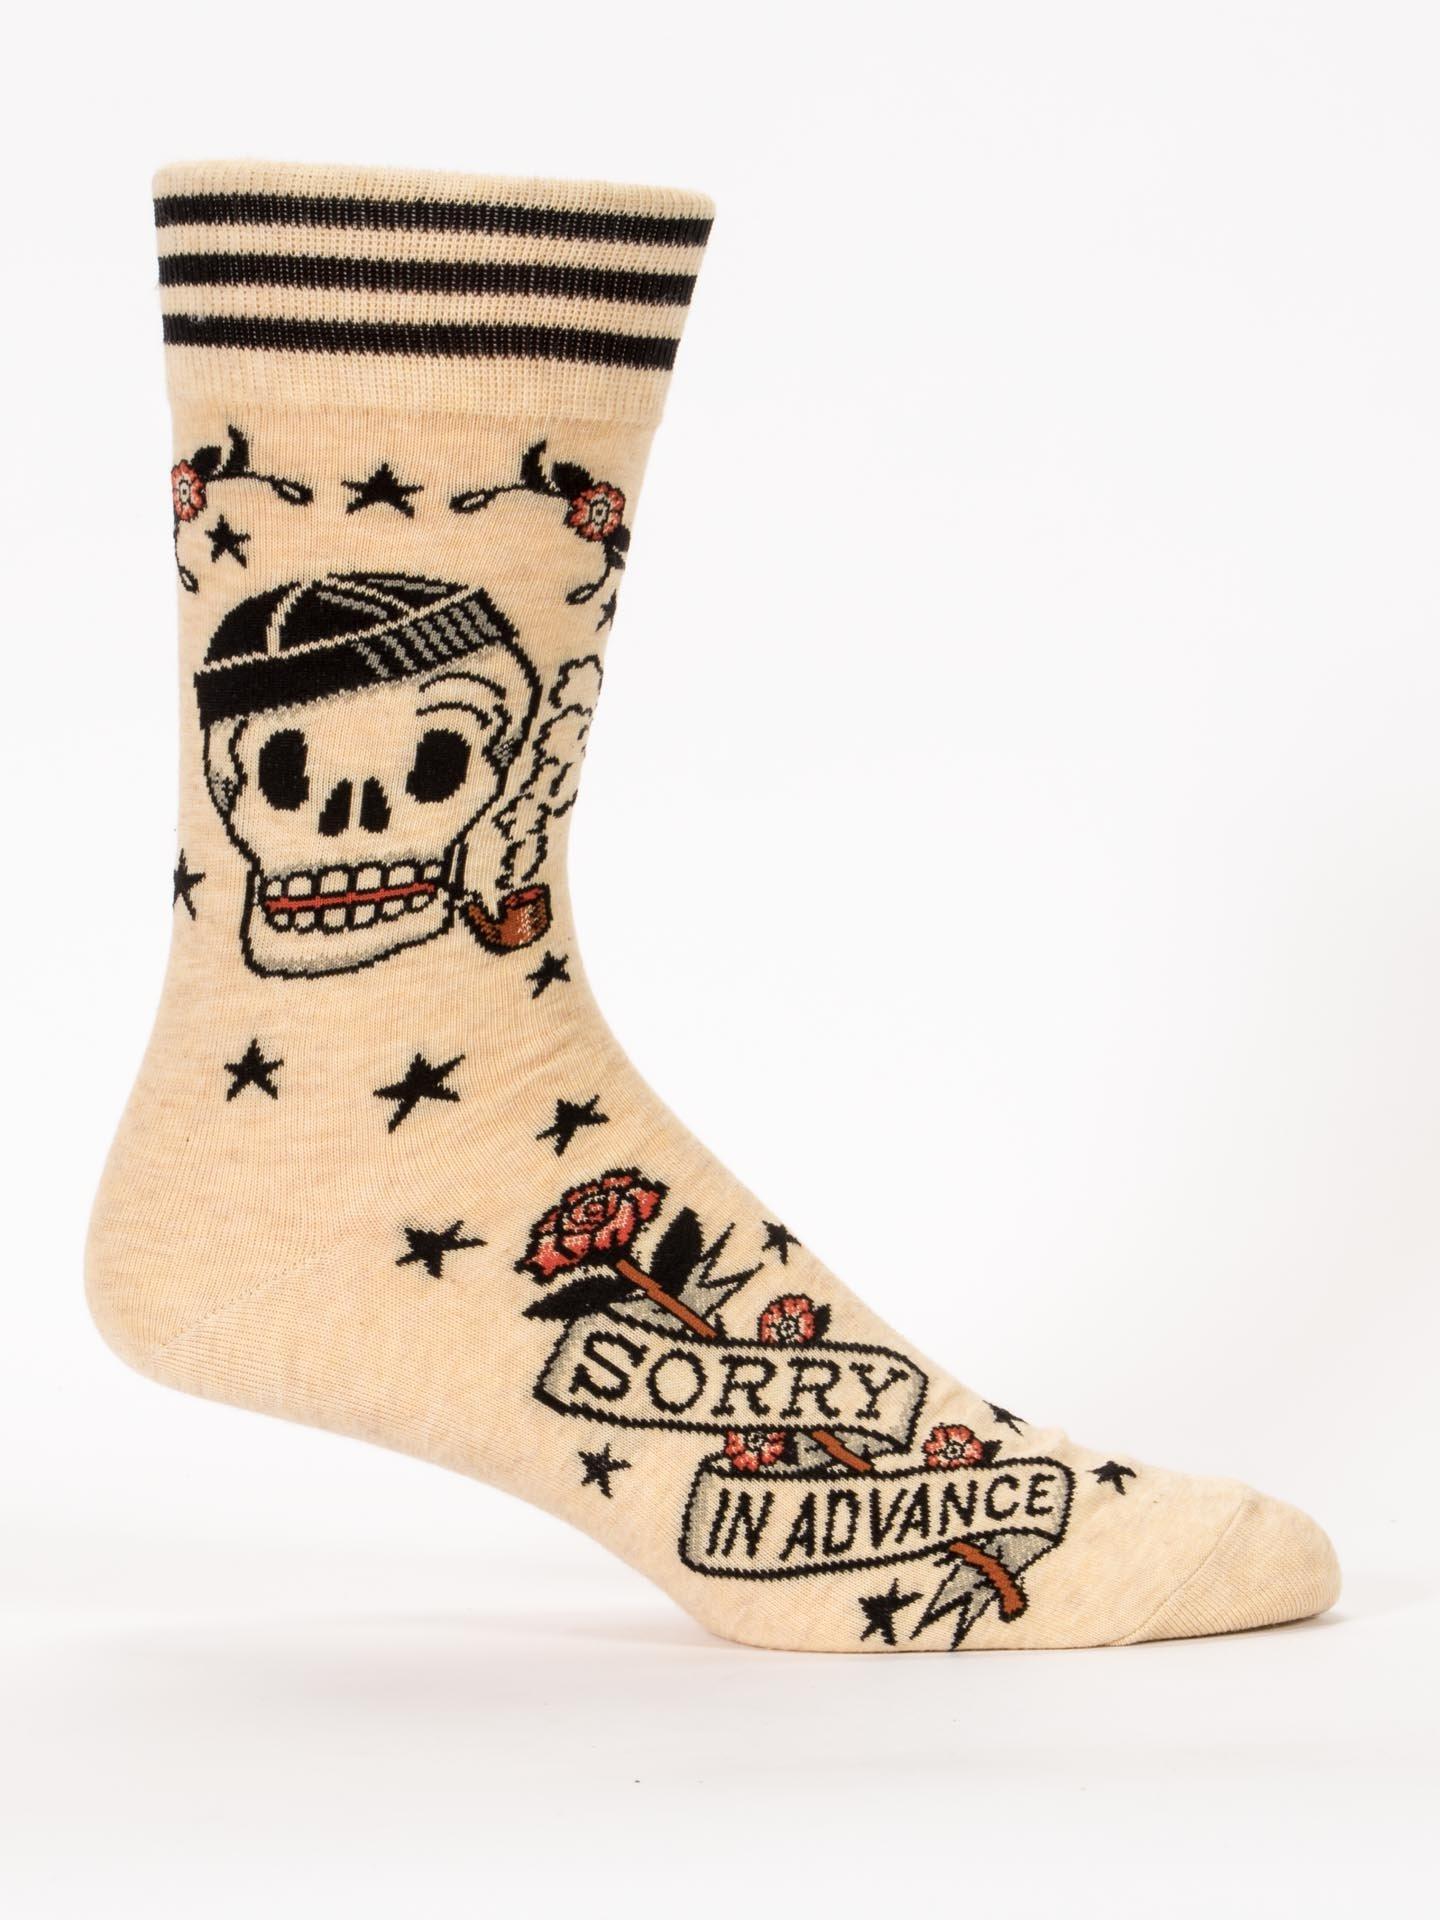 Blue Q Socks, Men's Crew, Sorry in Advance